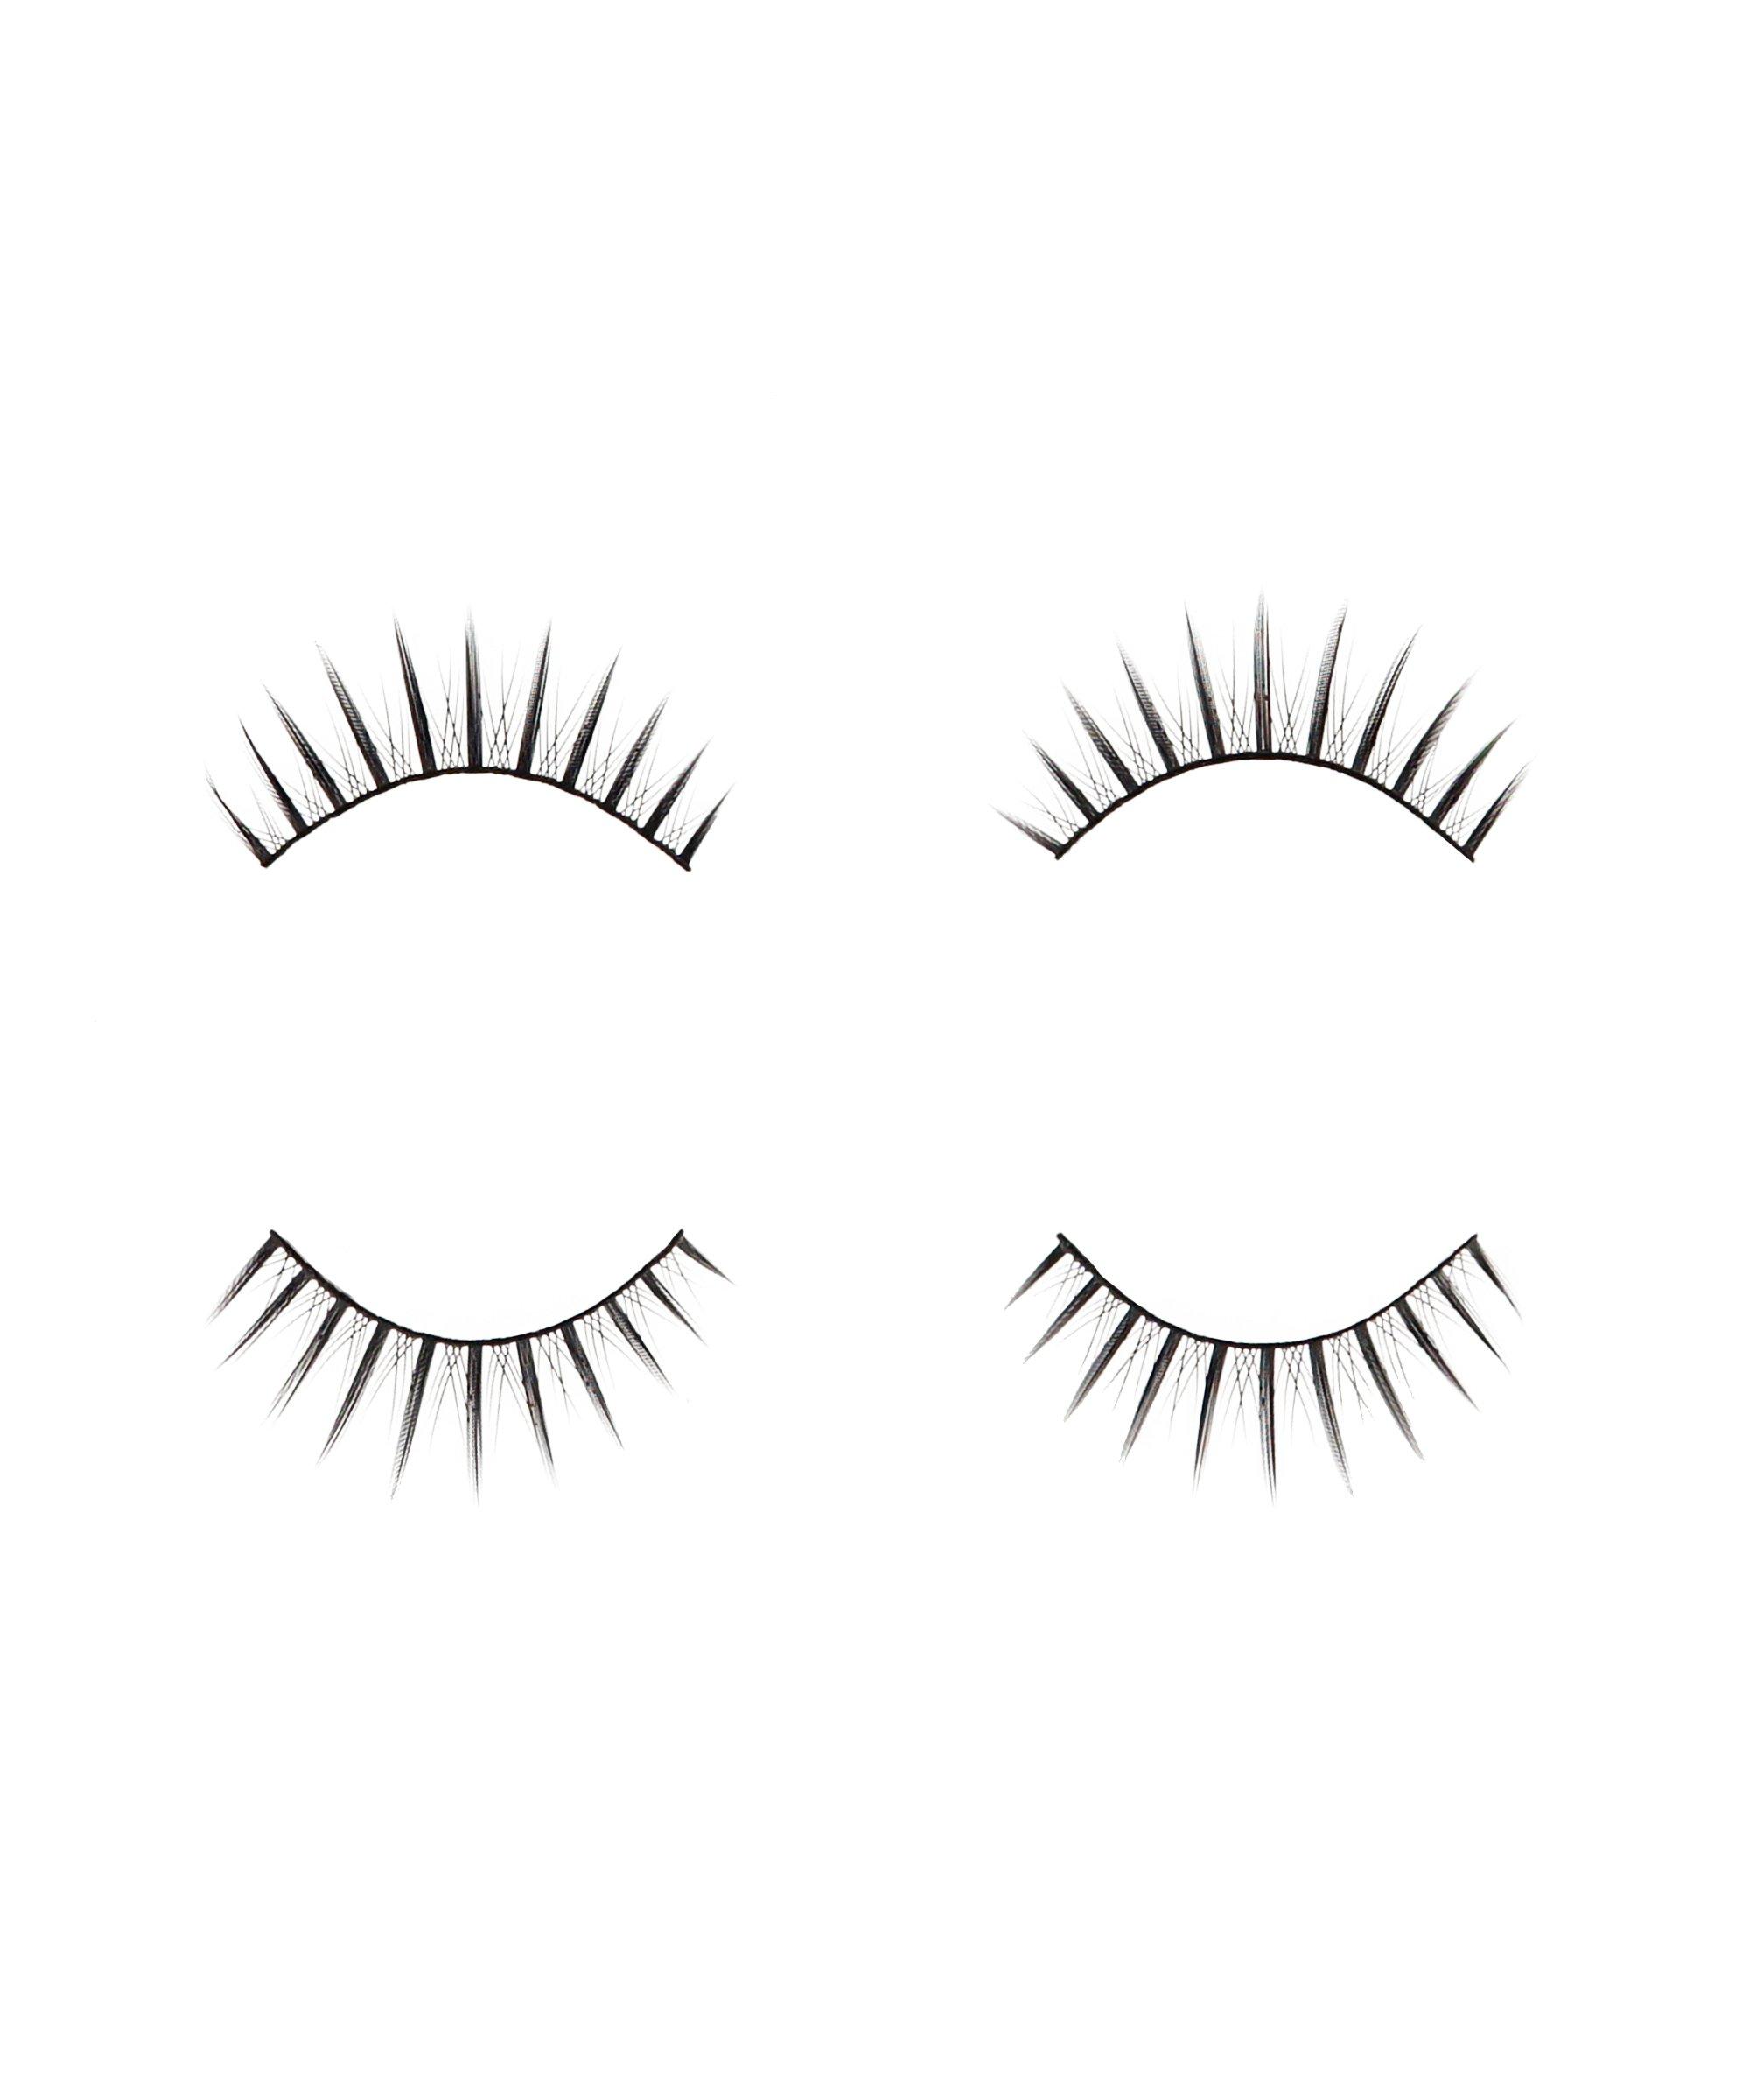 false eyelashes kma series two pairs emoji pinterest false